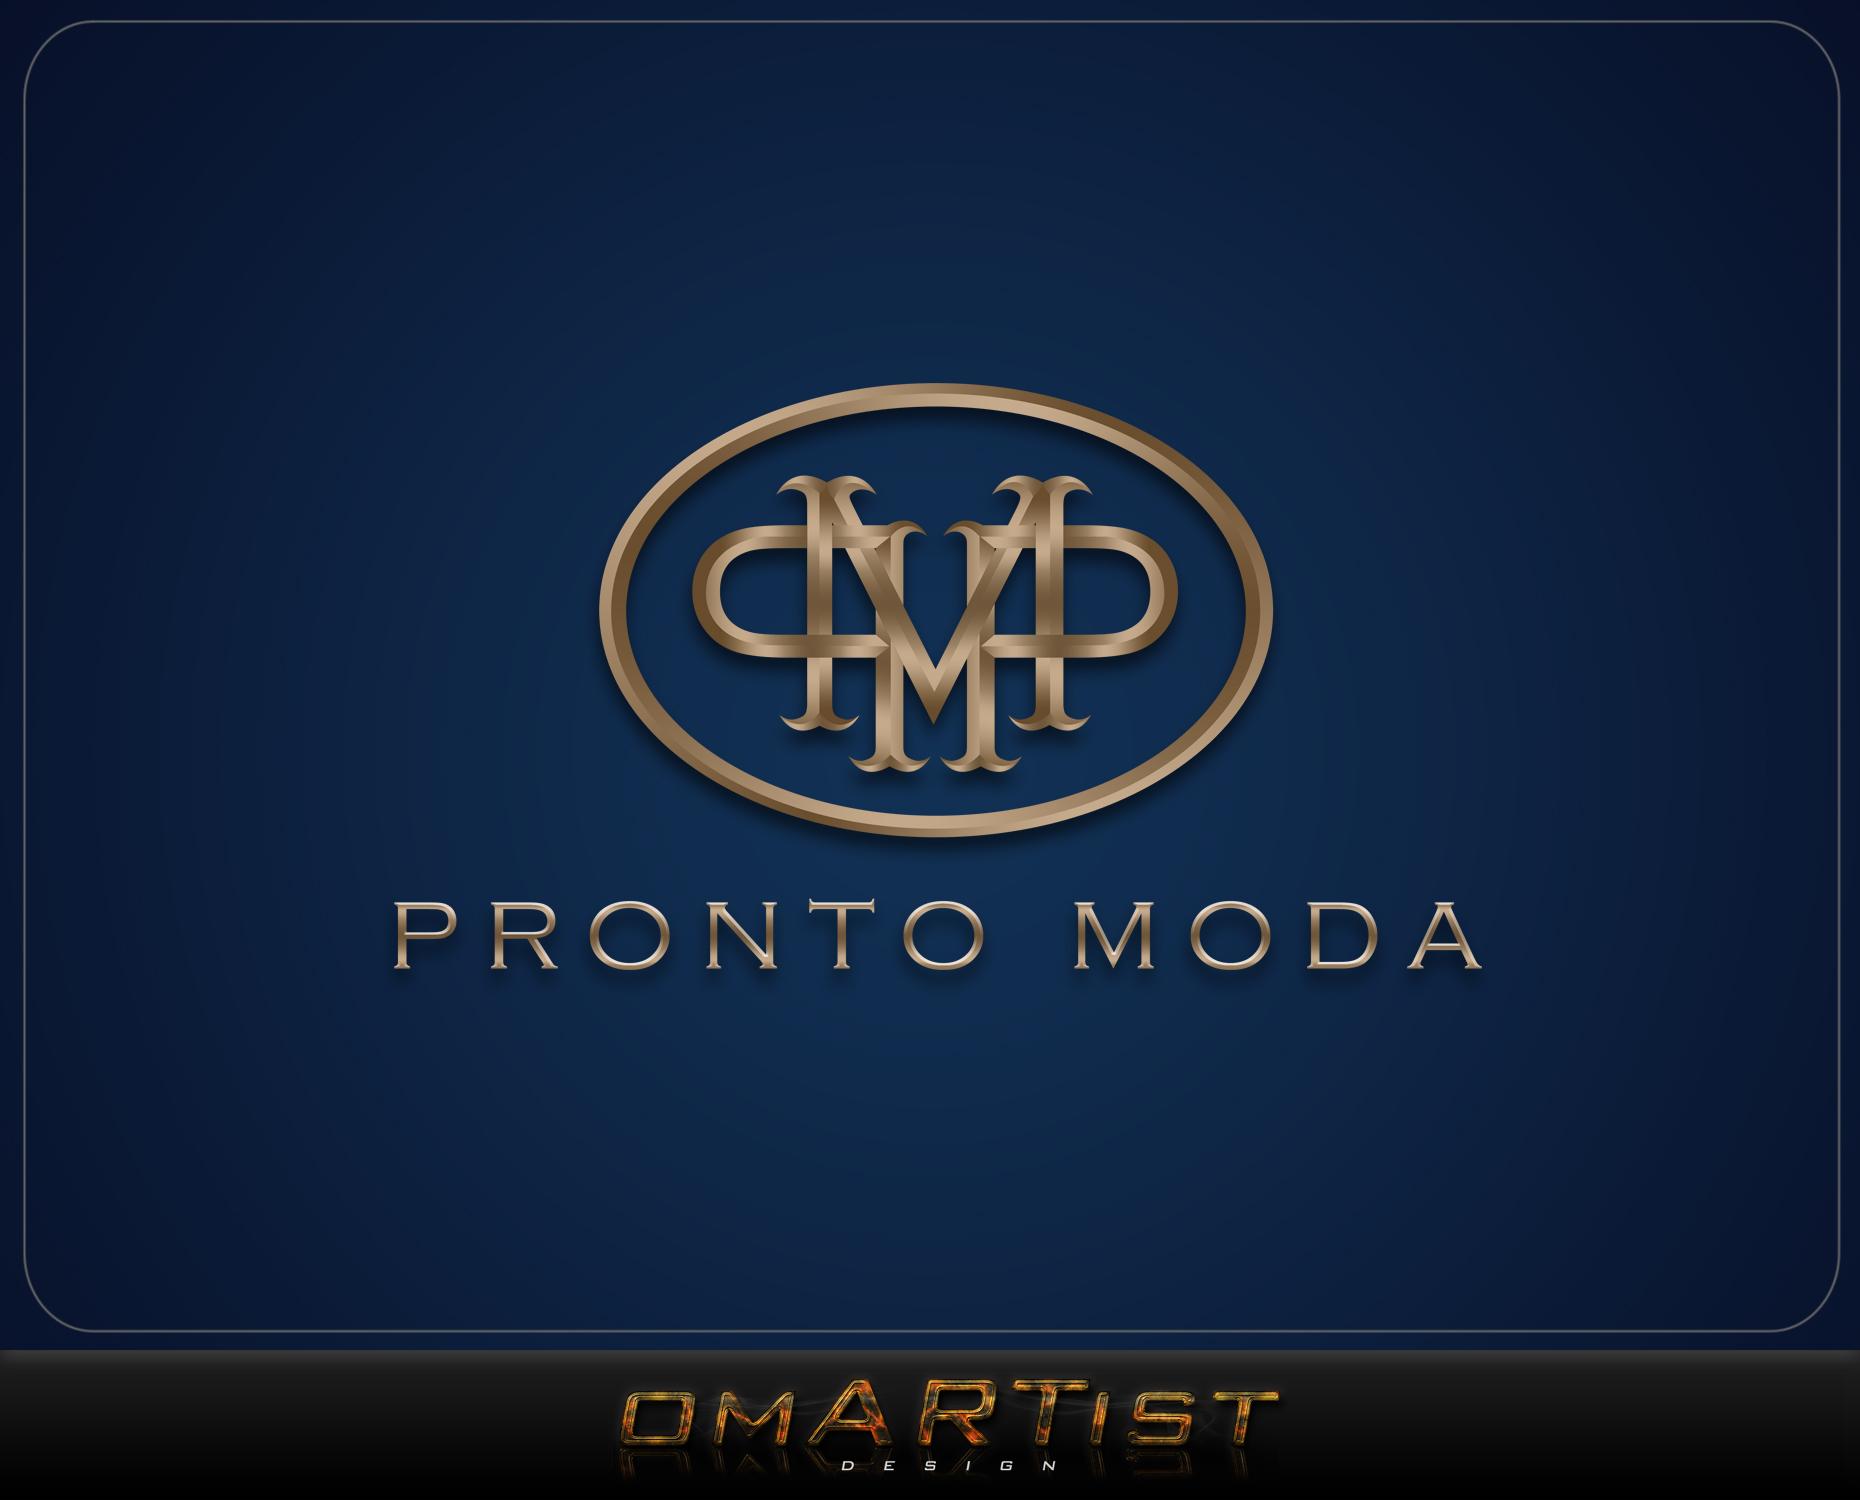 Logo Design by omARTist - Entry No. 65 in the Logo Design Contest Captivating Logo Design for Pronto moda.